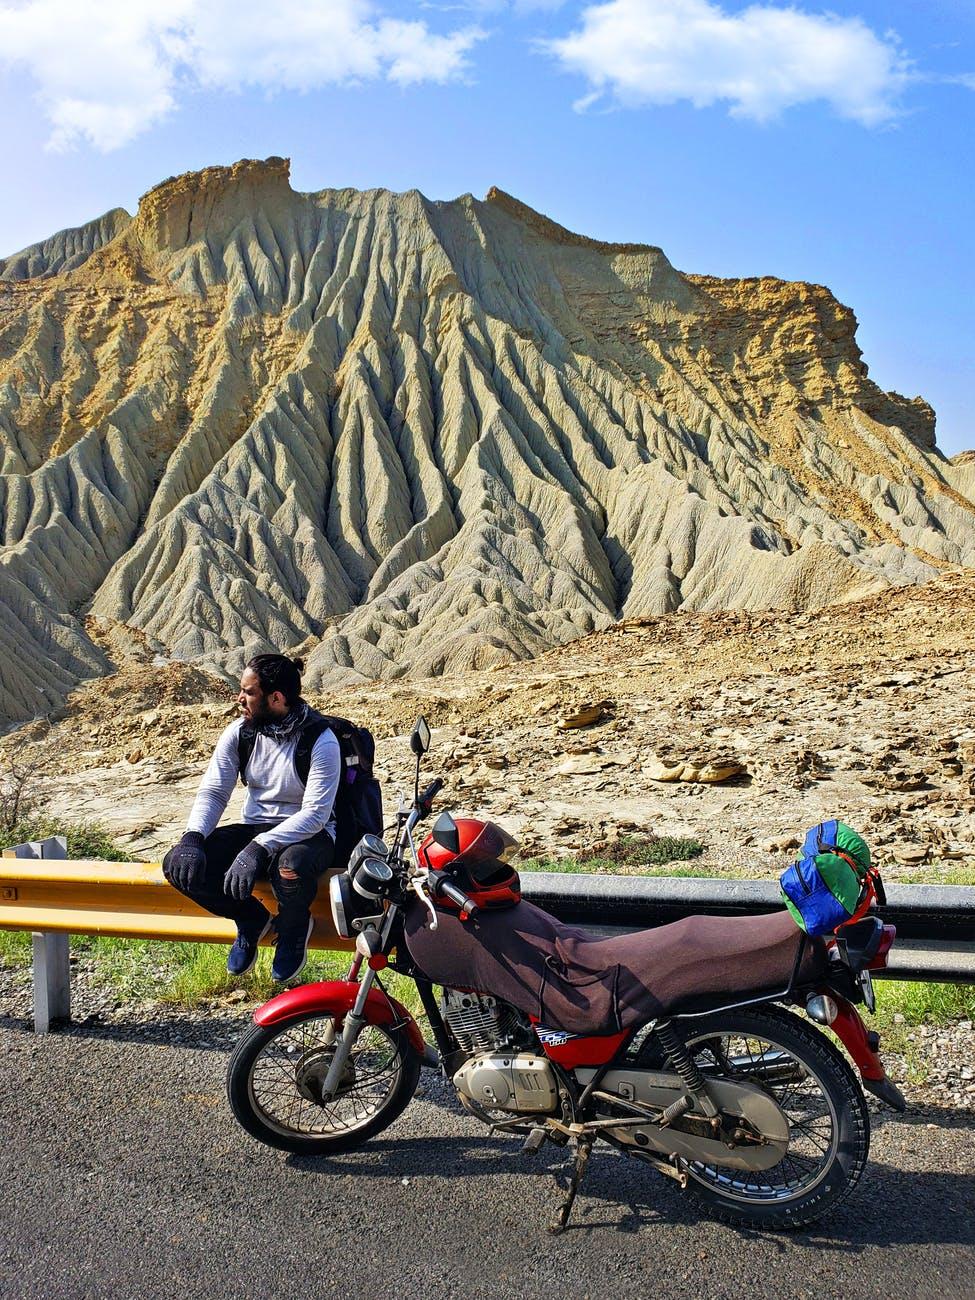 Bjerge og motorcykel